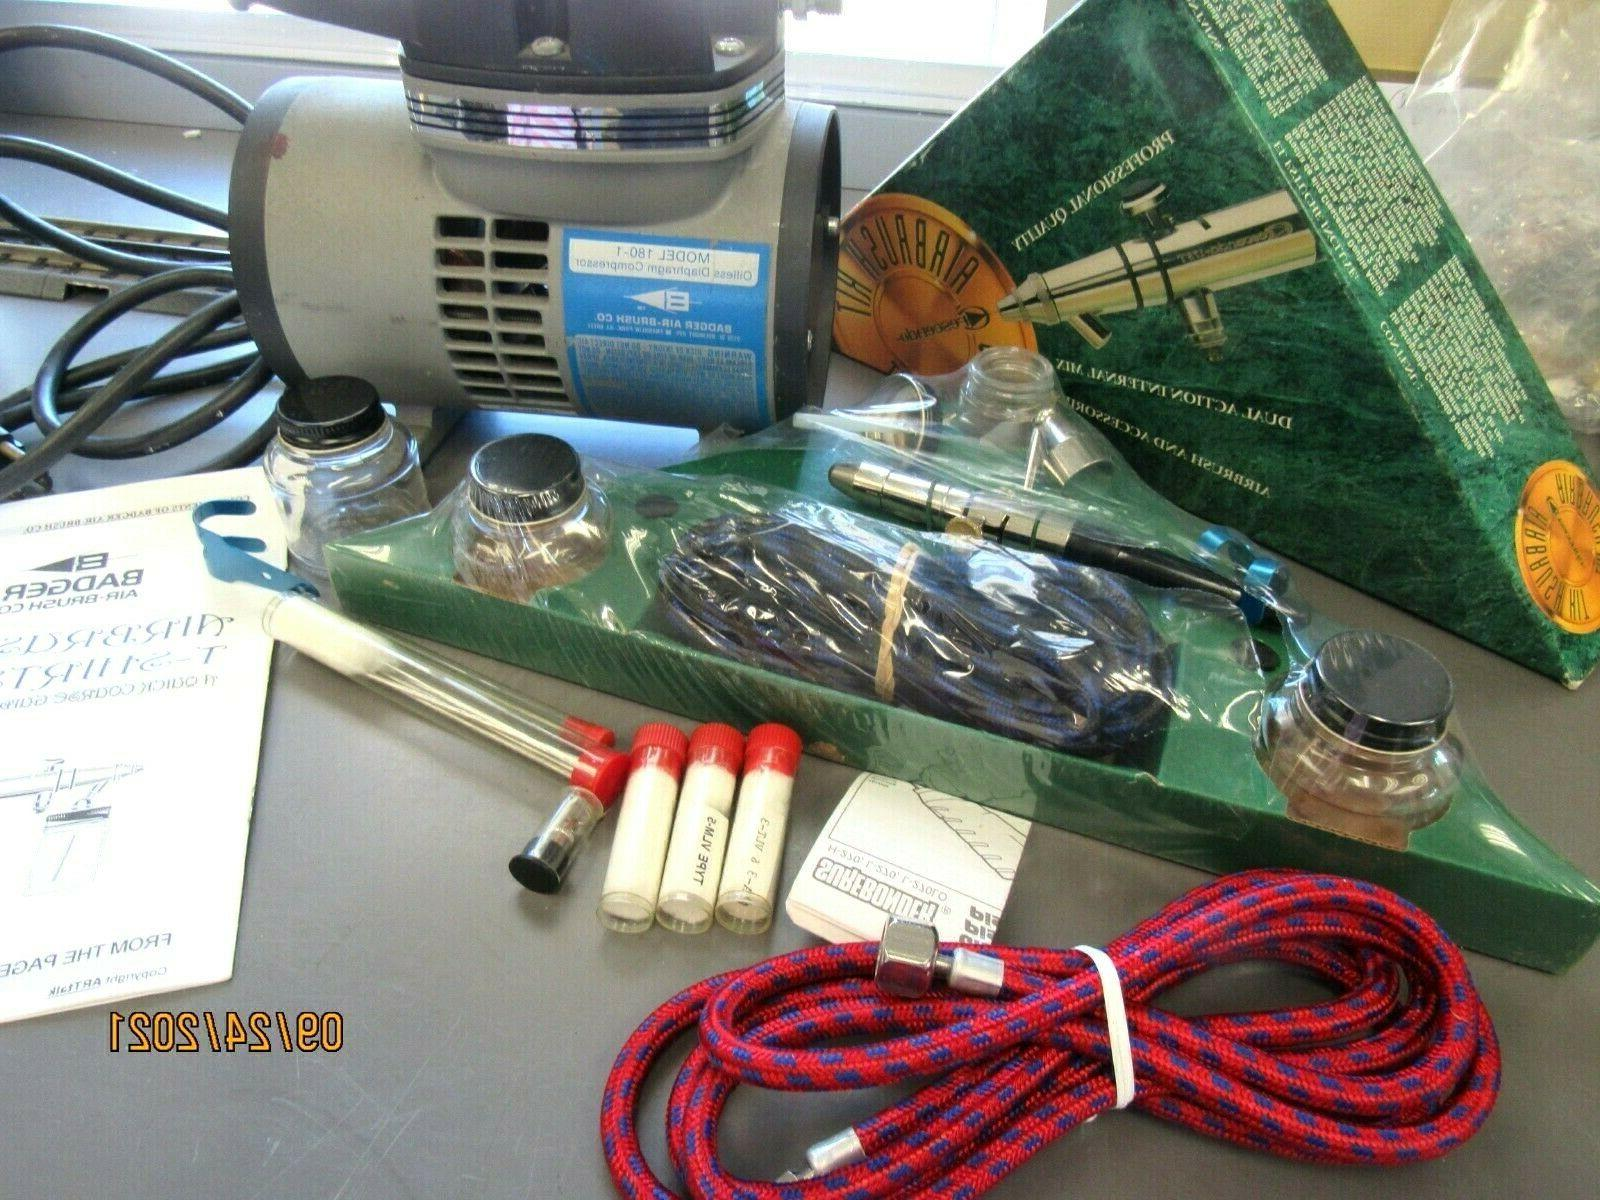 BADGER AIR BRUSH 175-7 KIT*NEW* COMPRESSOR 180-1